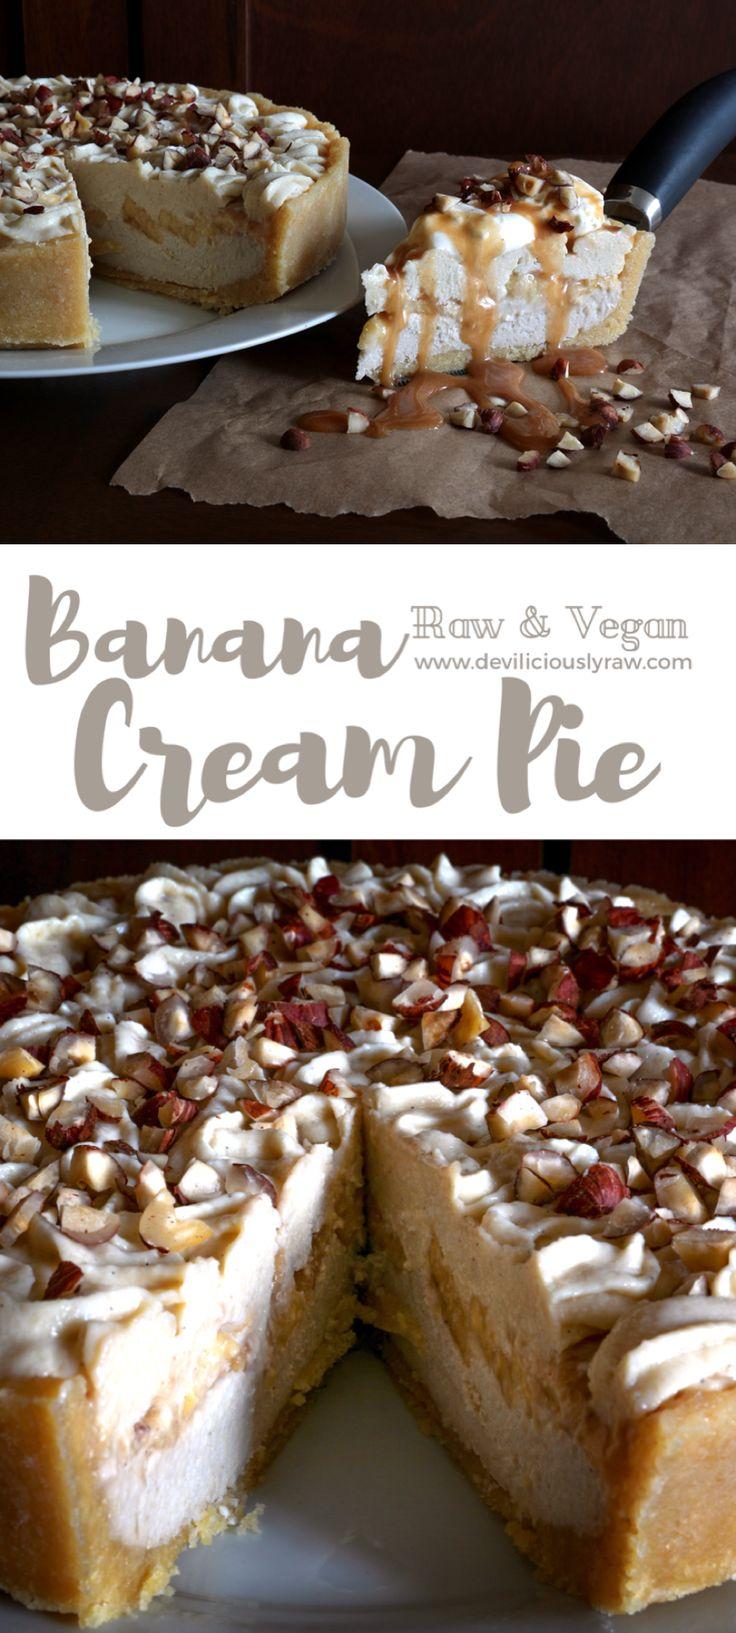 #raw #vegan Banana Cream Pie | Deviliciously Raw